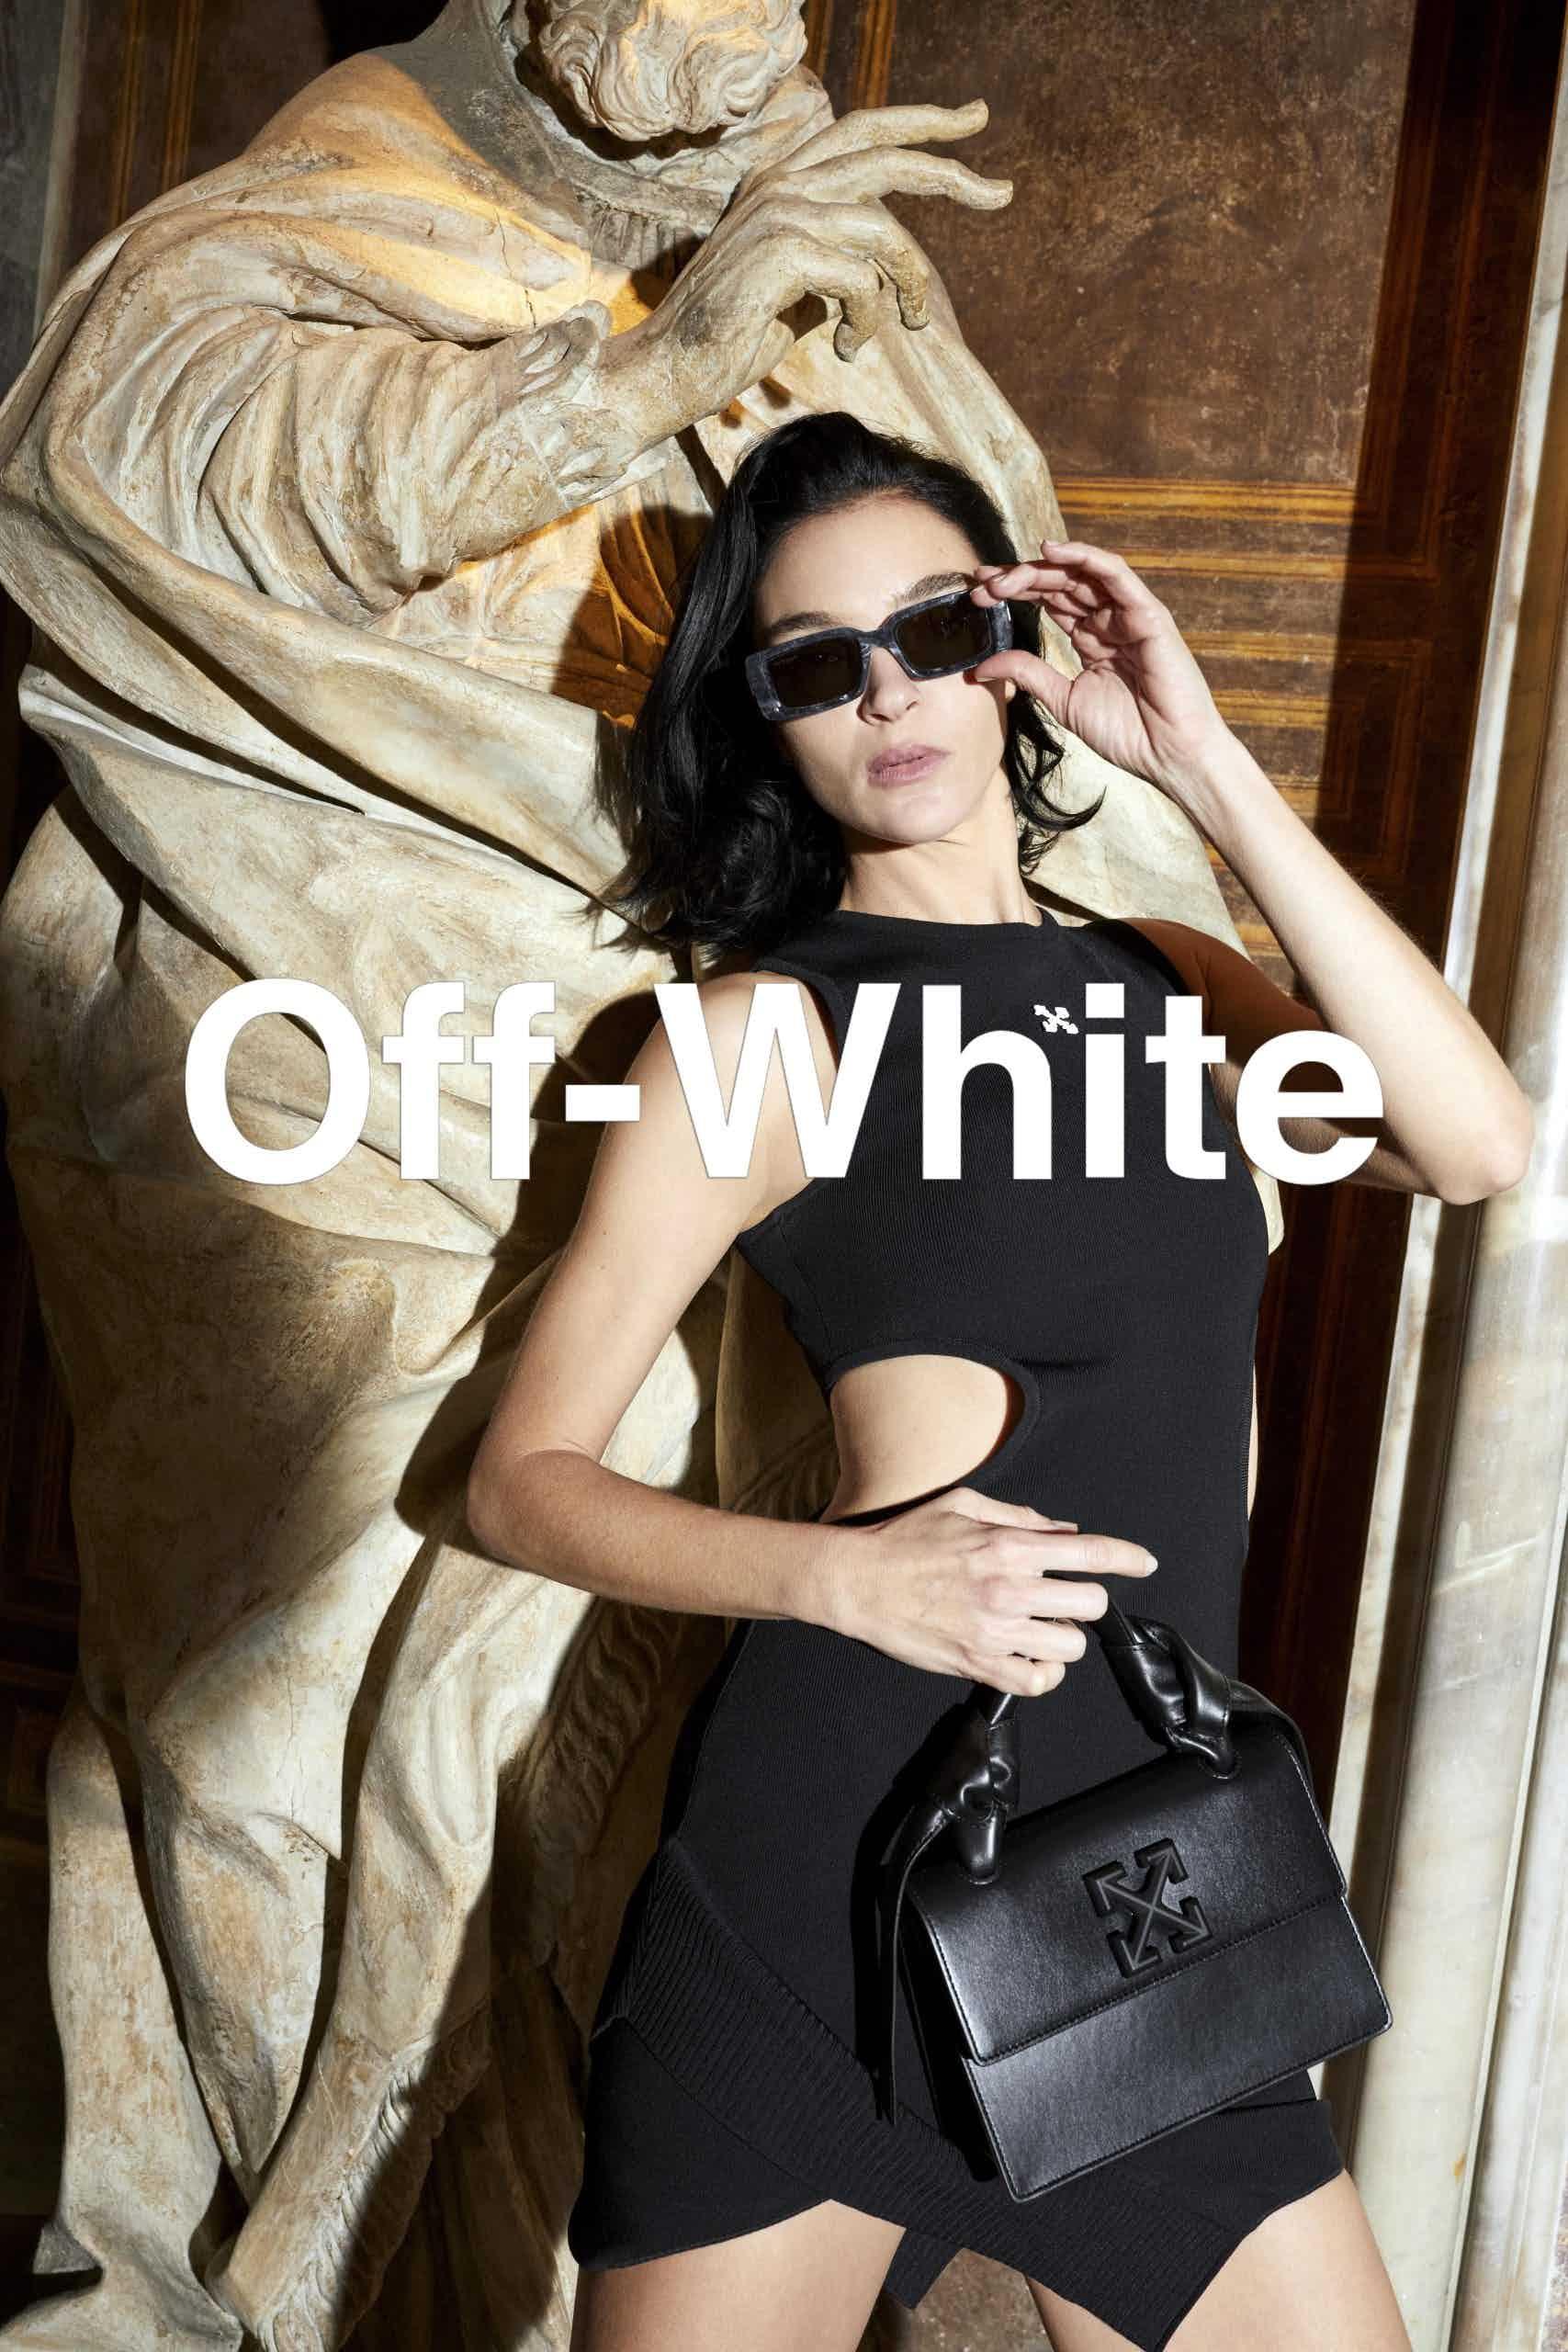 OFF-WHITE - Eyewear/Bags Campaign Photographer: Juergen Teller Model: Mariacarla Boscono Stylist: Malcolm Edwards Location: Naples, Italy